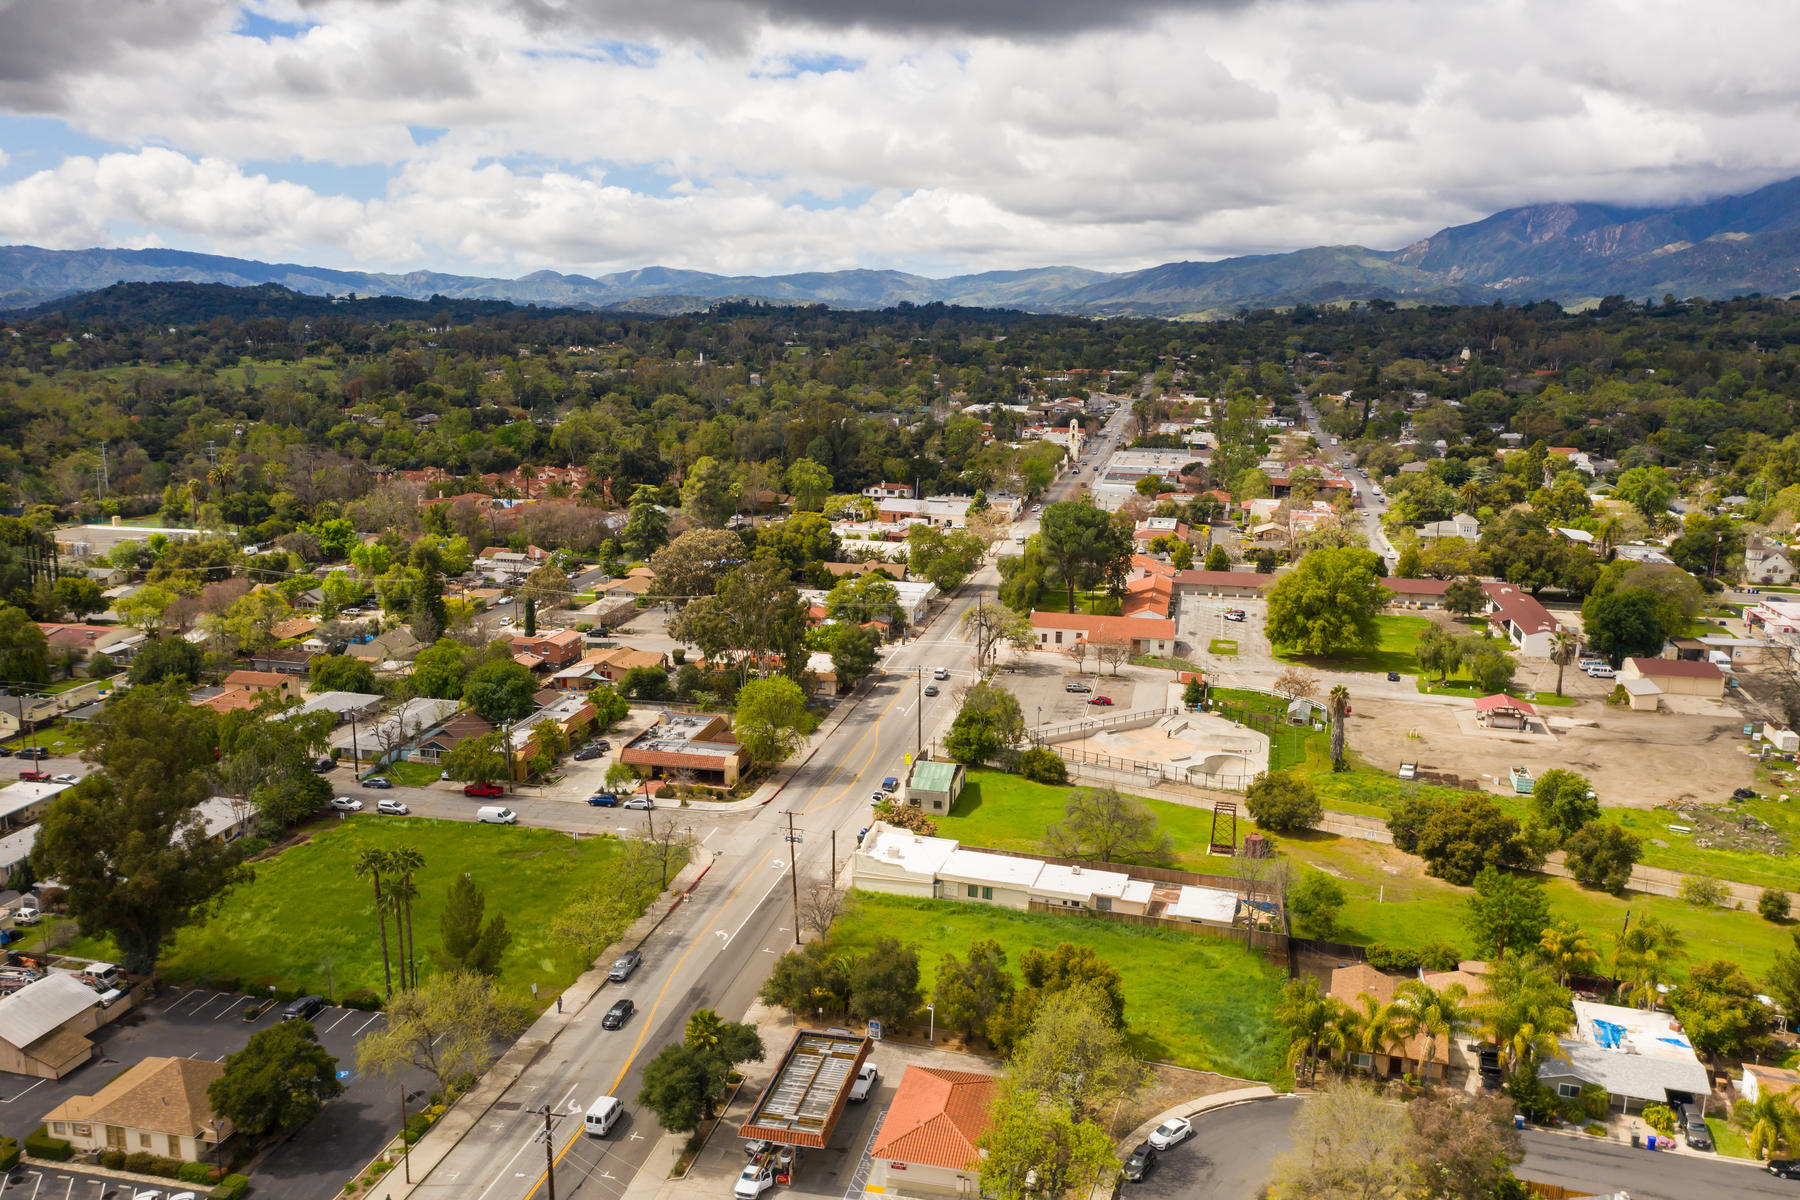 土地,用地 为 销售 在 Extremely rare Commercial Property with Development potential on Ojai Avenue 608 East Ojai Avenue 奥海镇, 加利福尼亚州 93023 美国